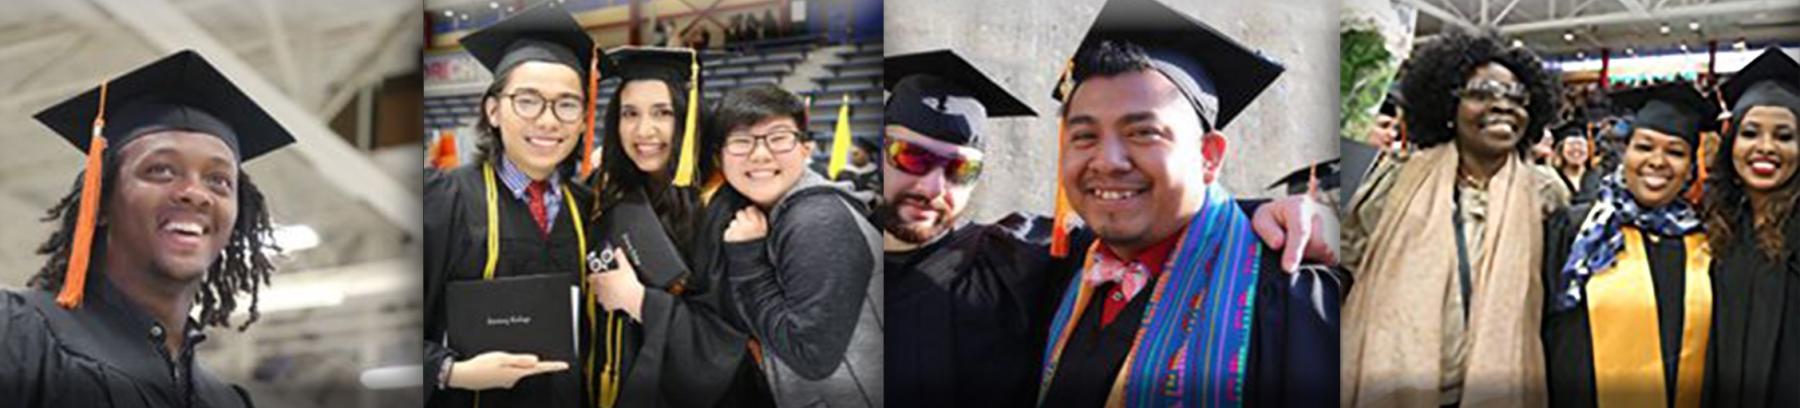 multicultural center graduation event